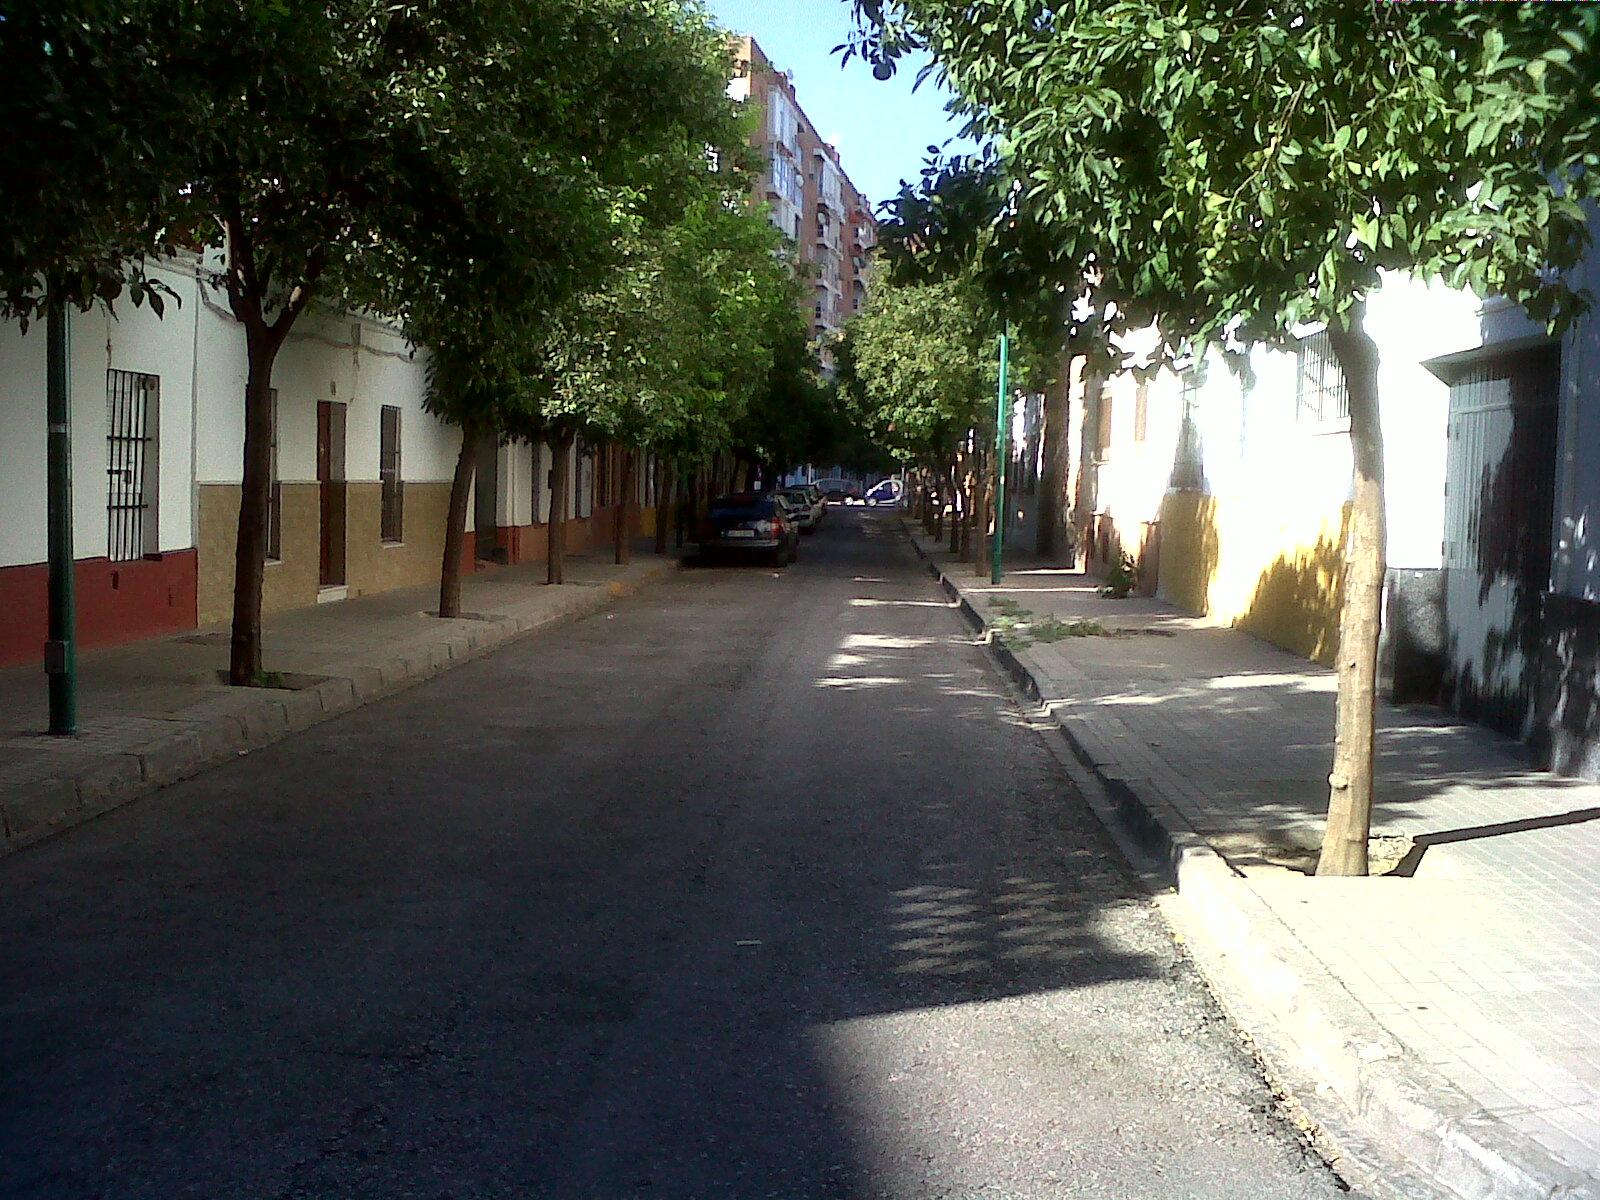 El porvenir de sevilla la calle california - Calle correduria sevilla ...